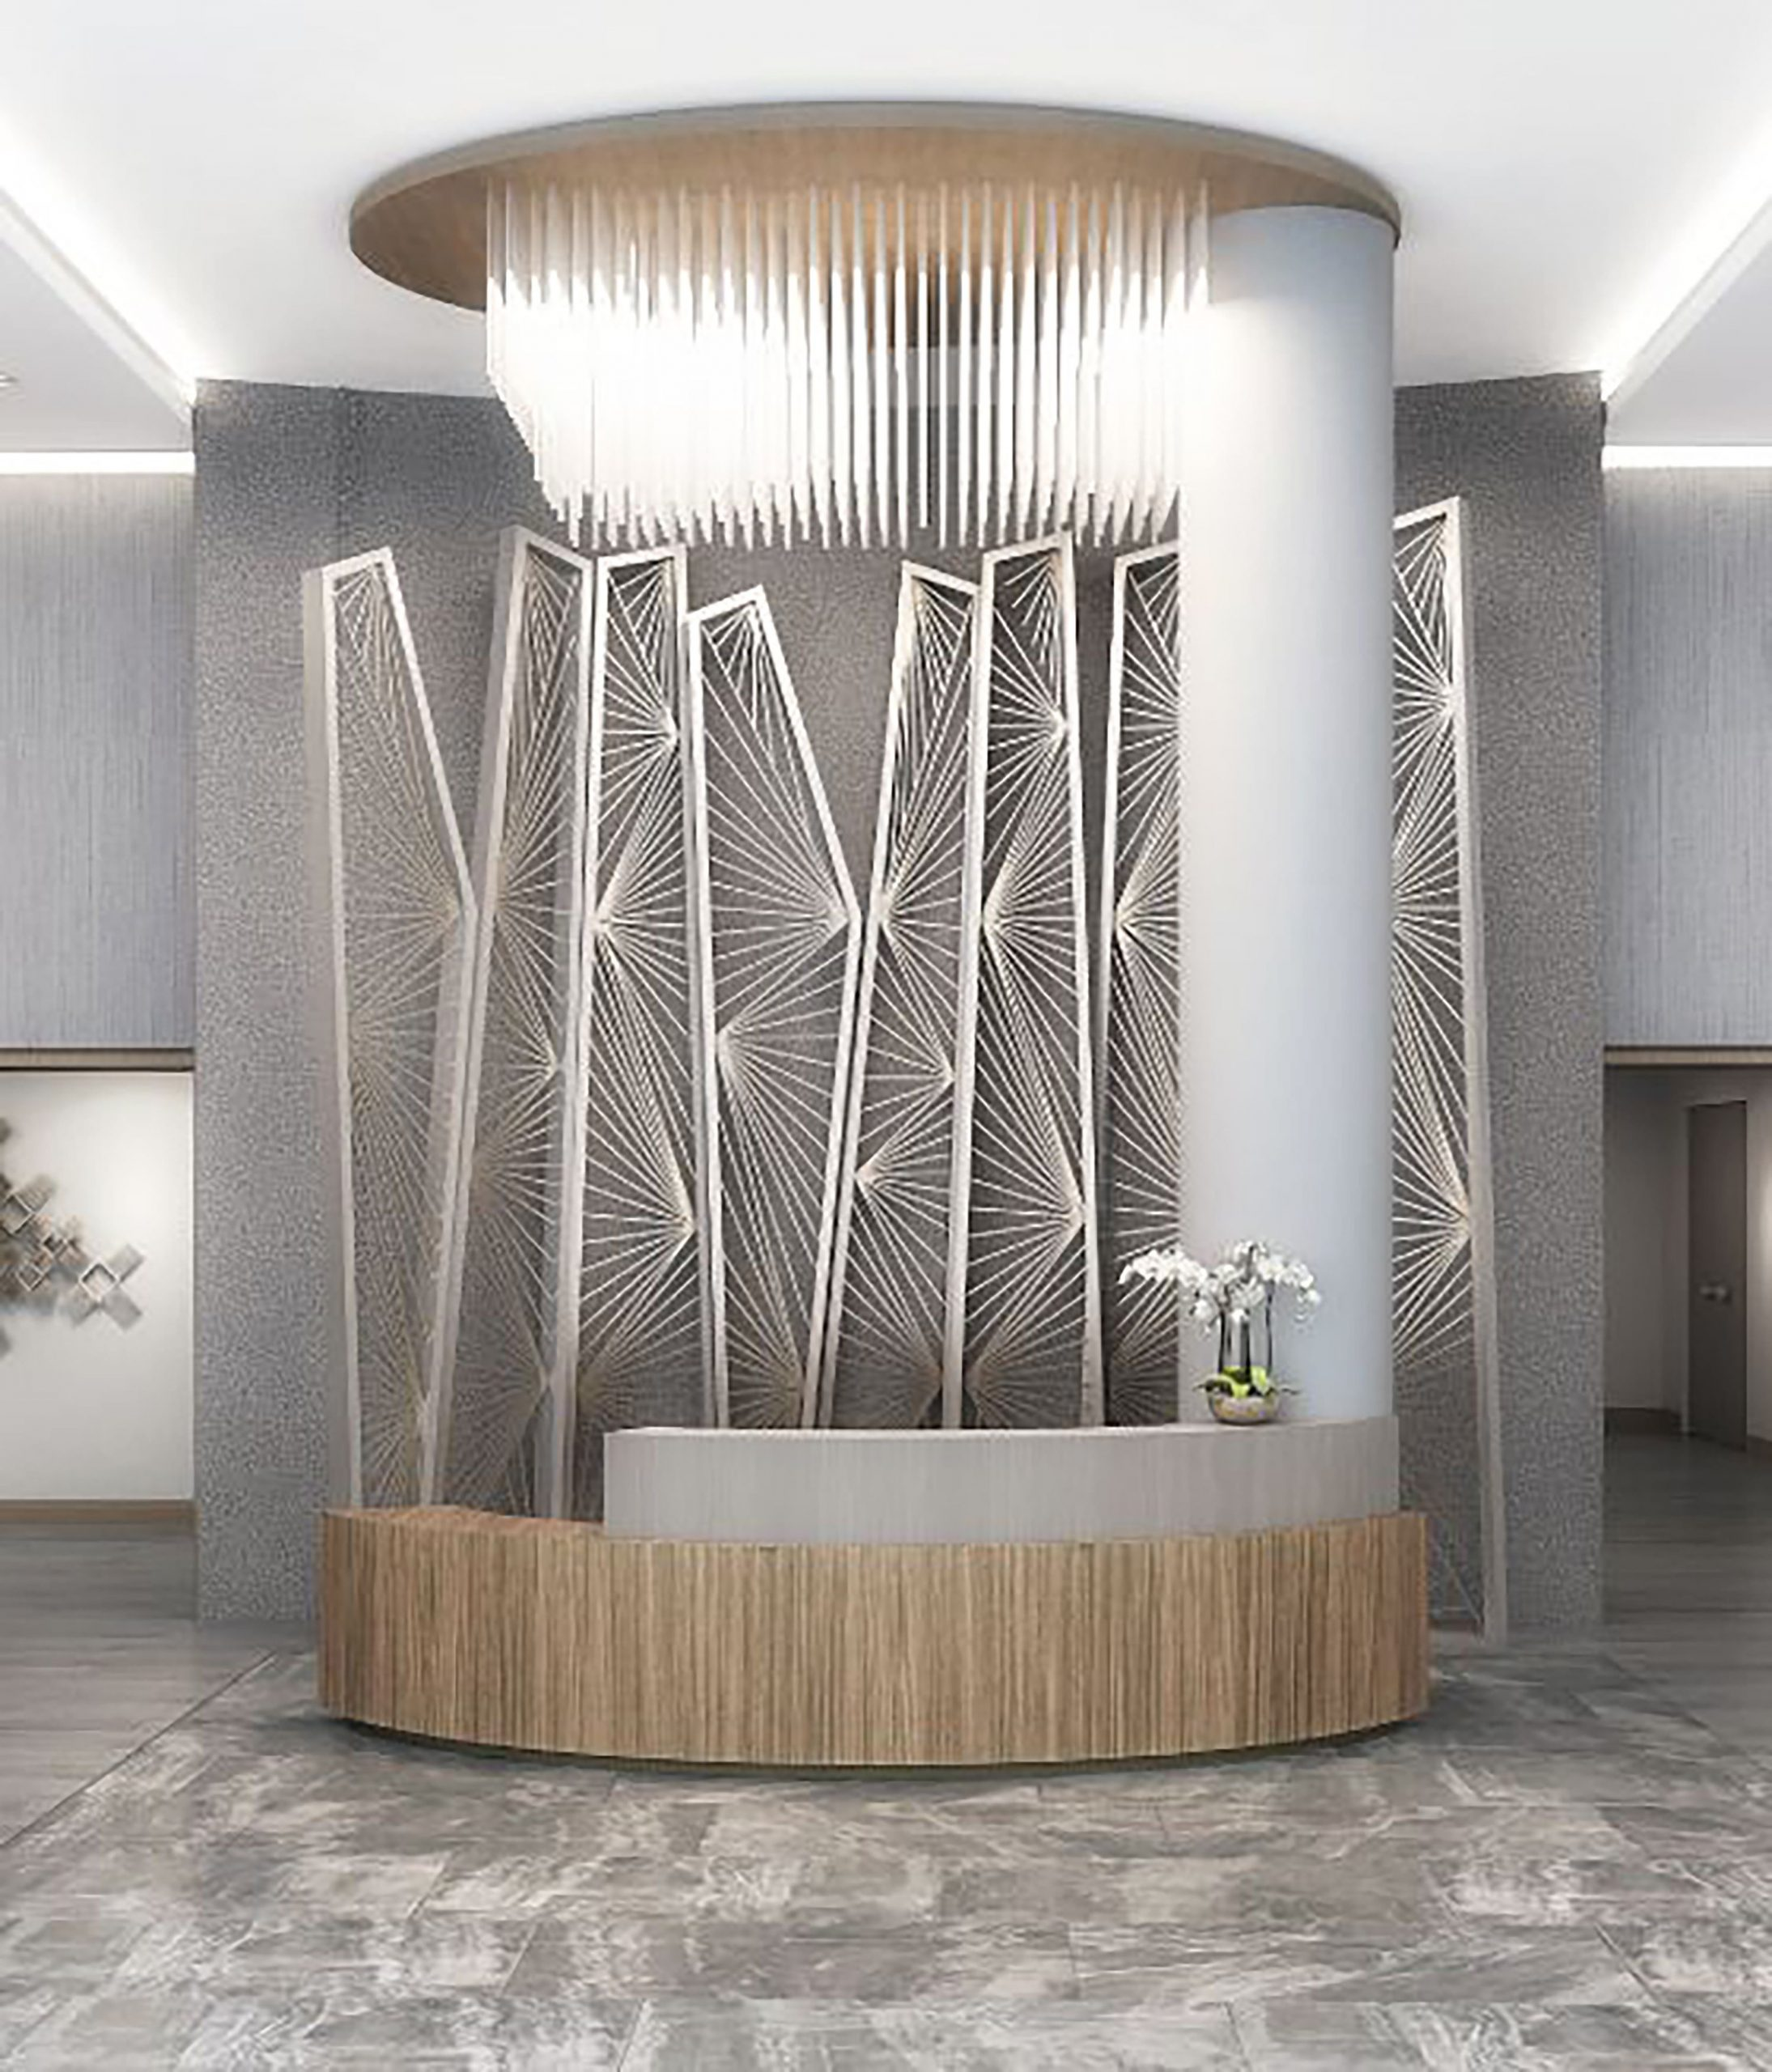 Doral Tower - Lobby